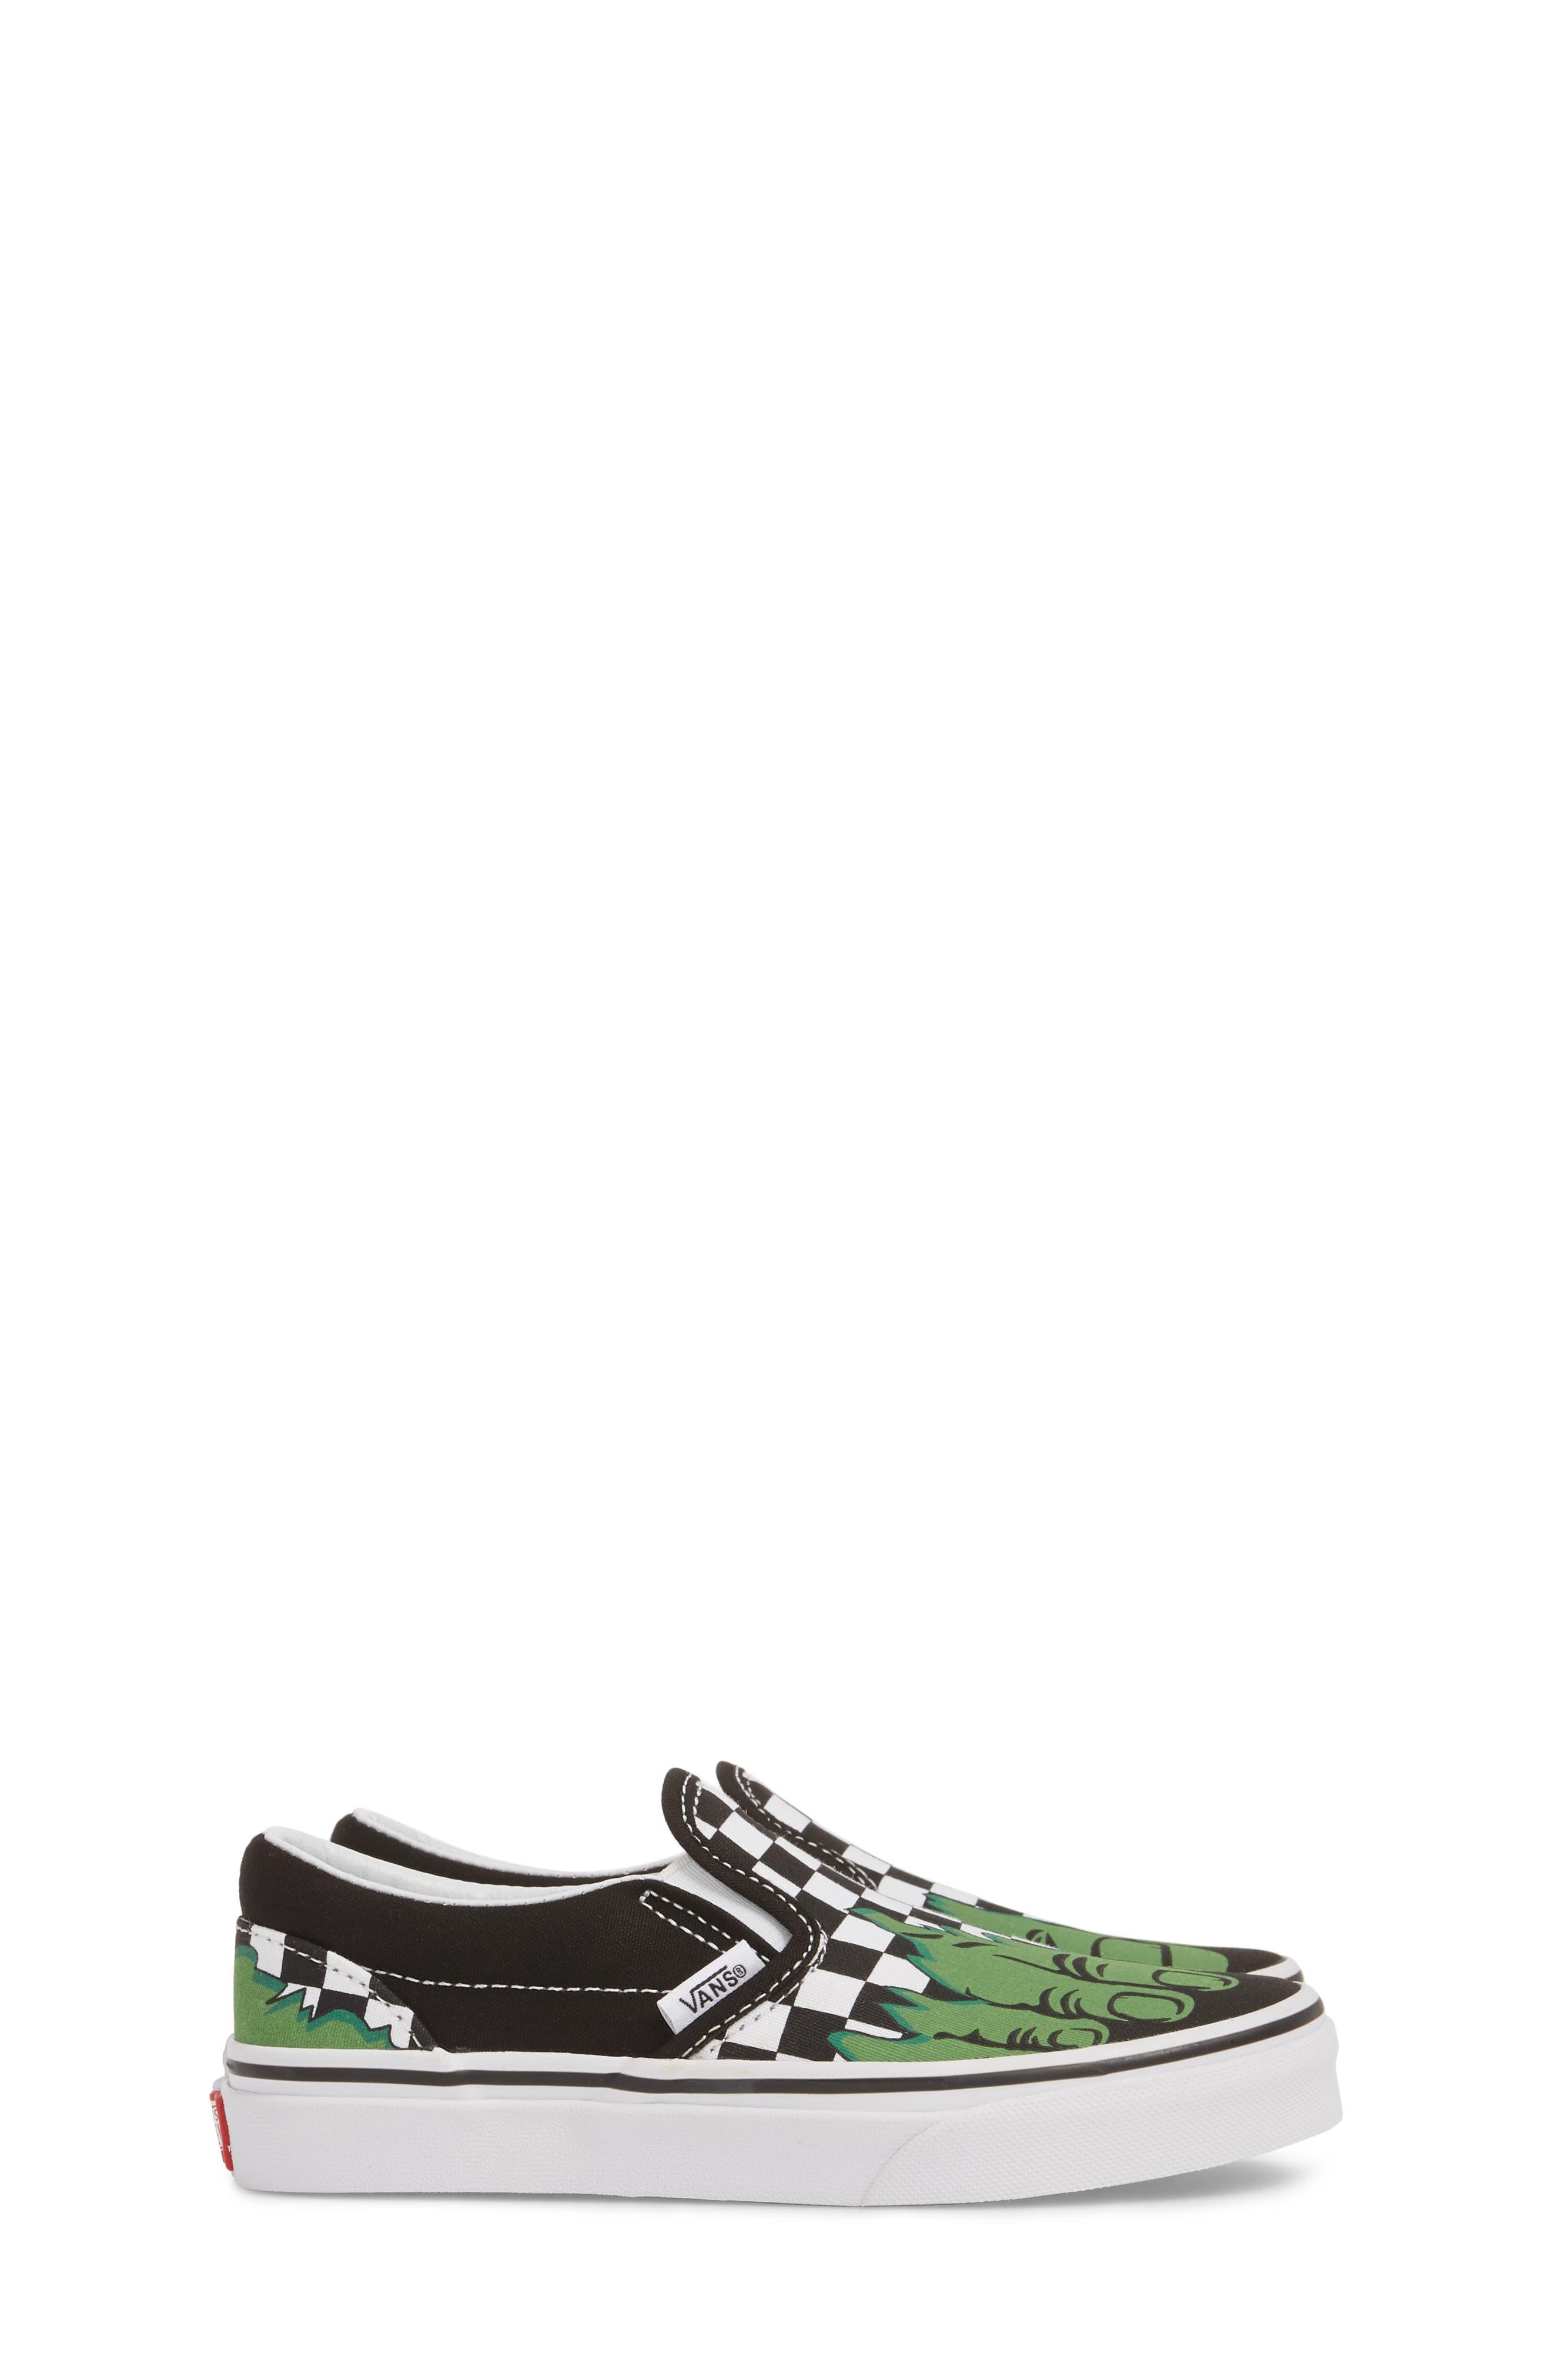 x Marvel<sup>®</sup> Hulk Checkerboard Slip-On Sneaker,                             Alternate thumbnail 4, color,                             310